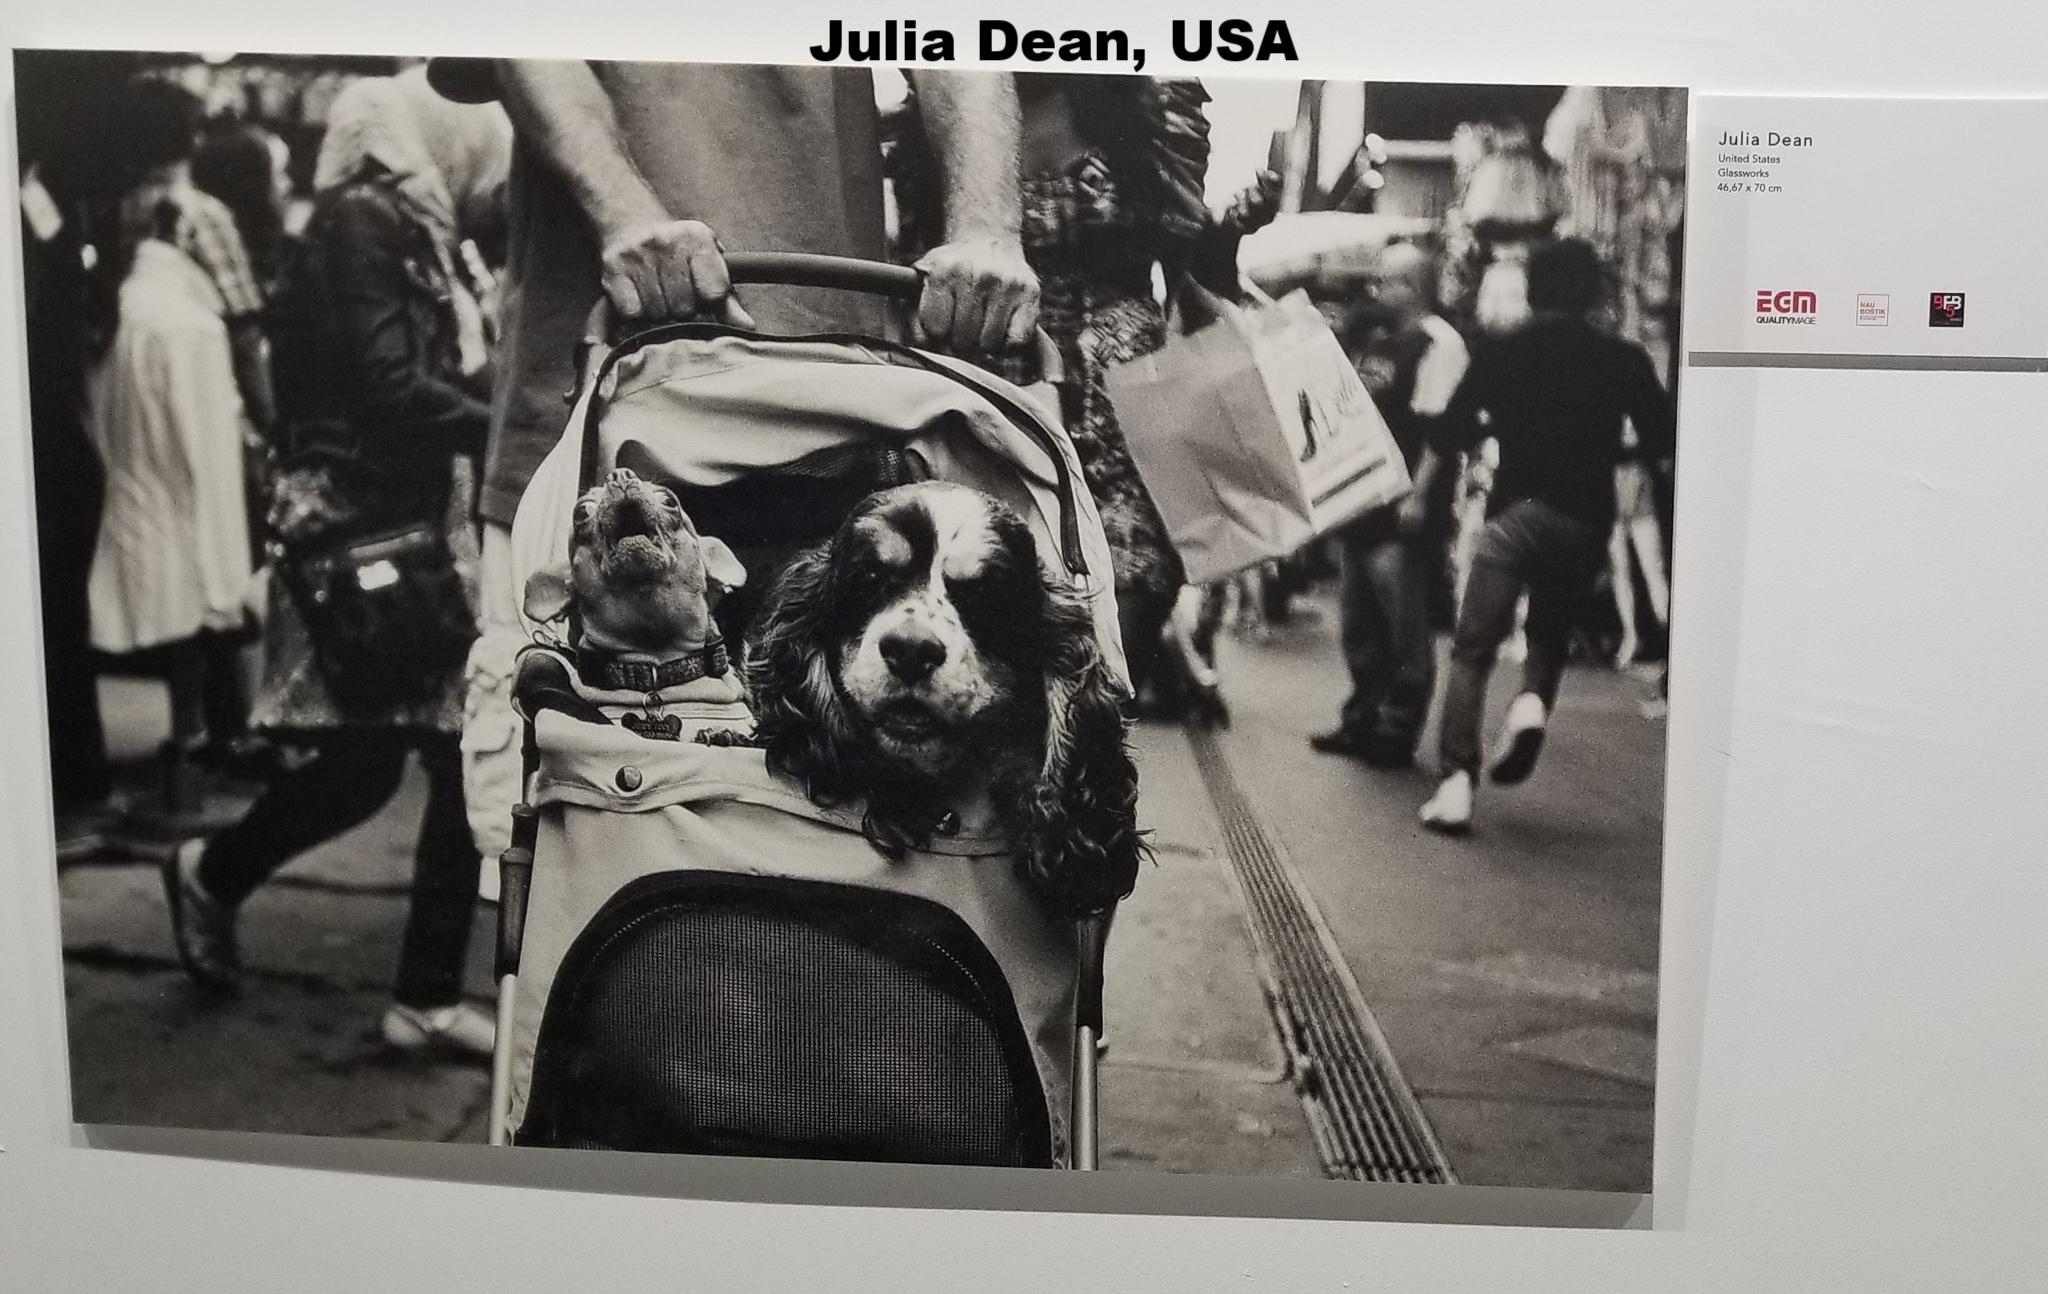 Julia Dean, United States